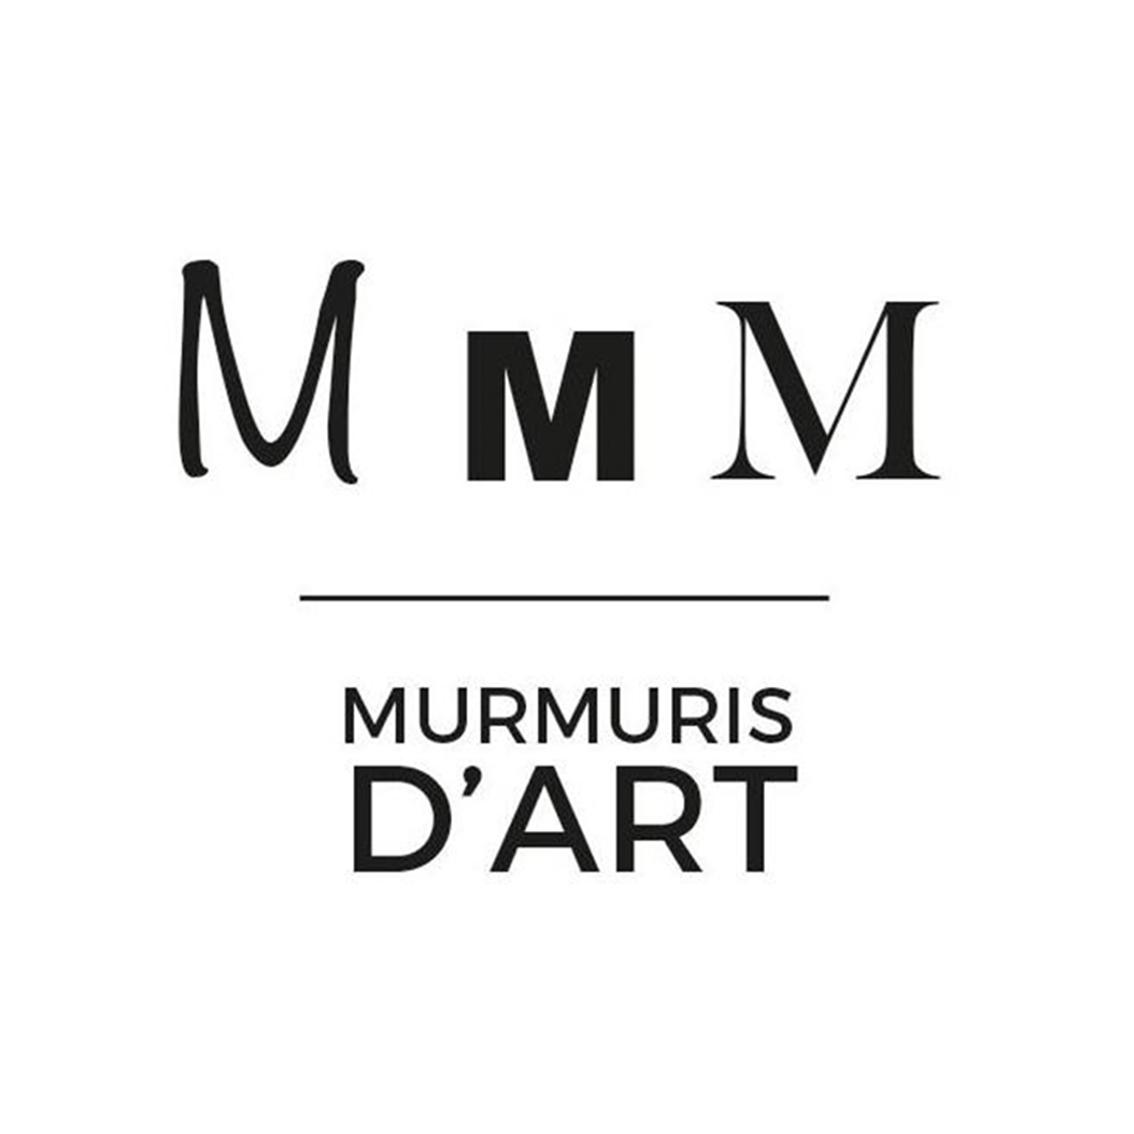 Programa de ràdio Murmuris d'Art